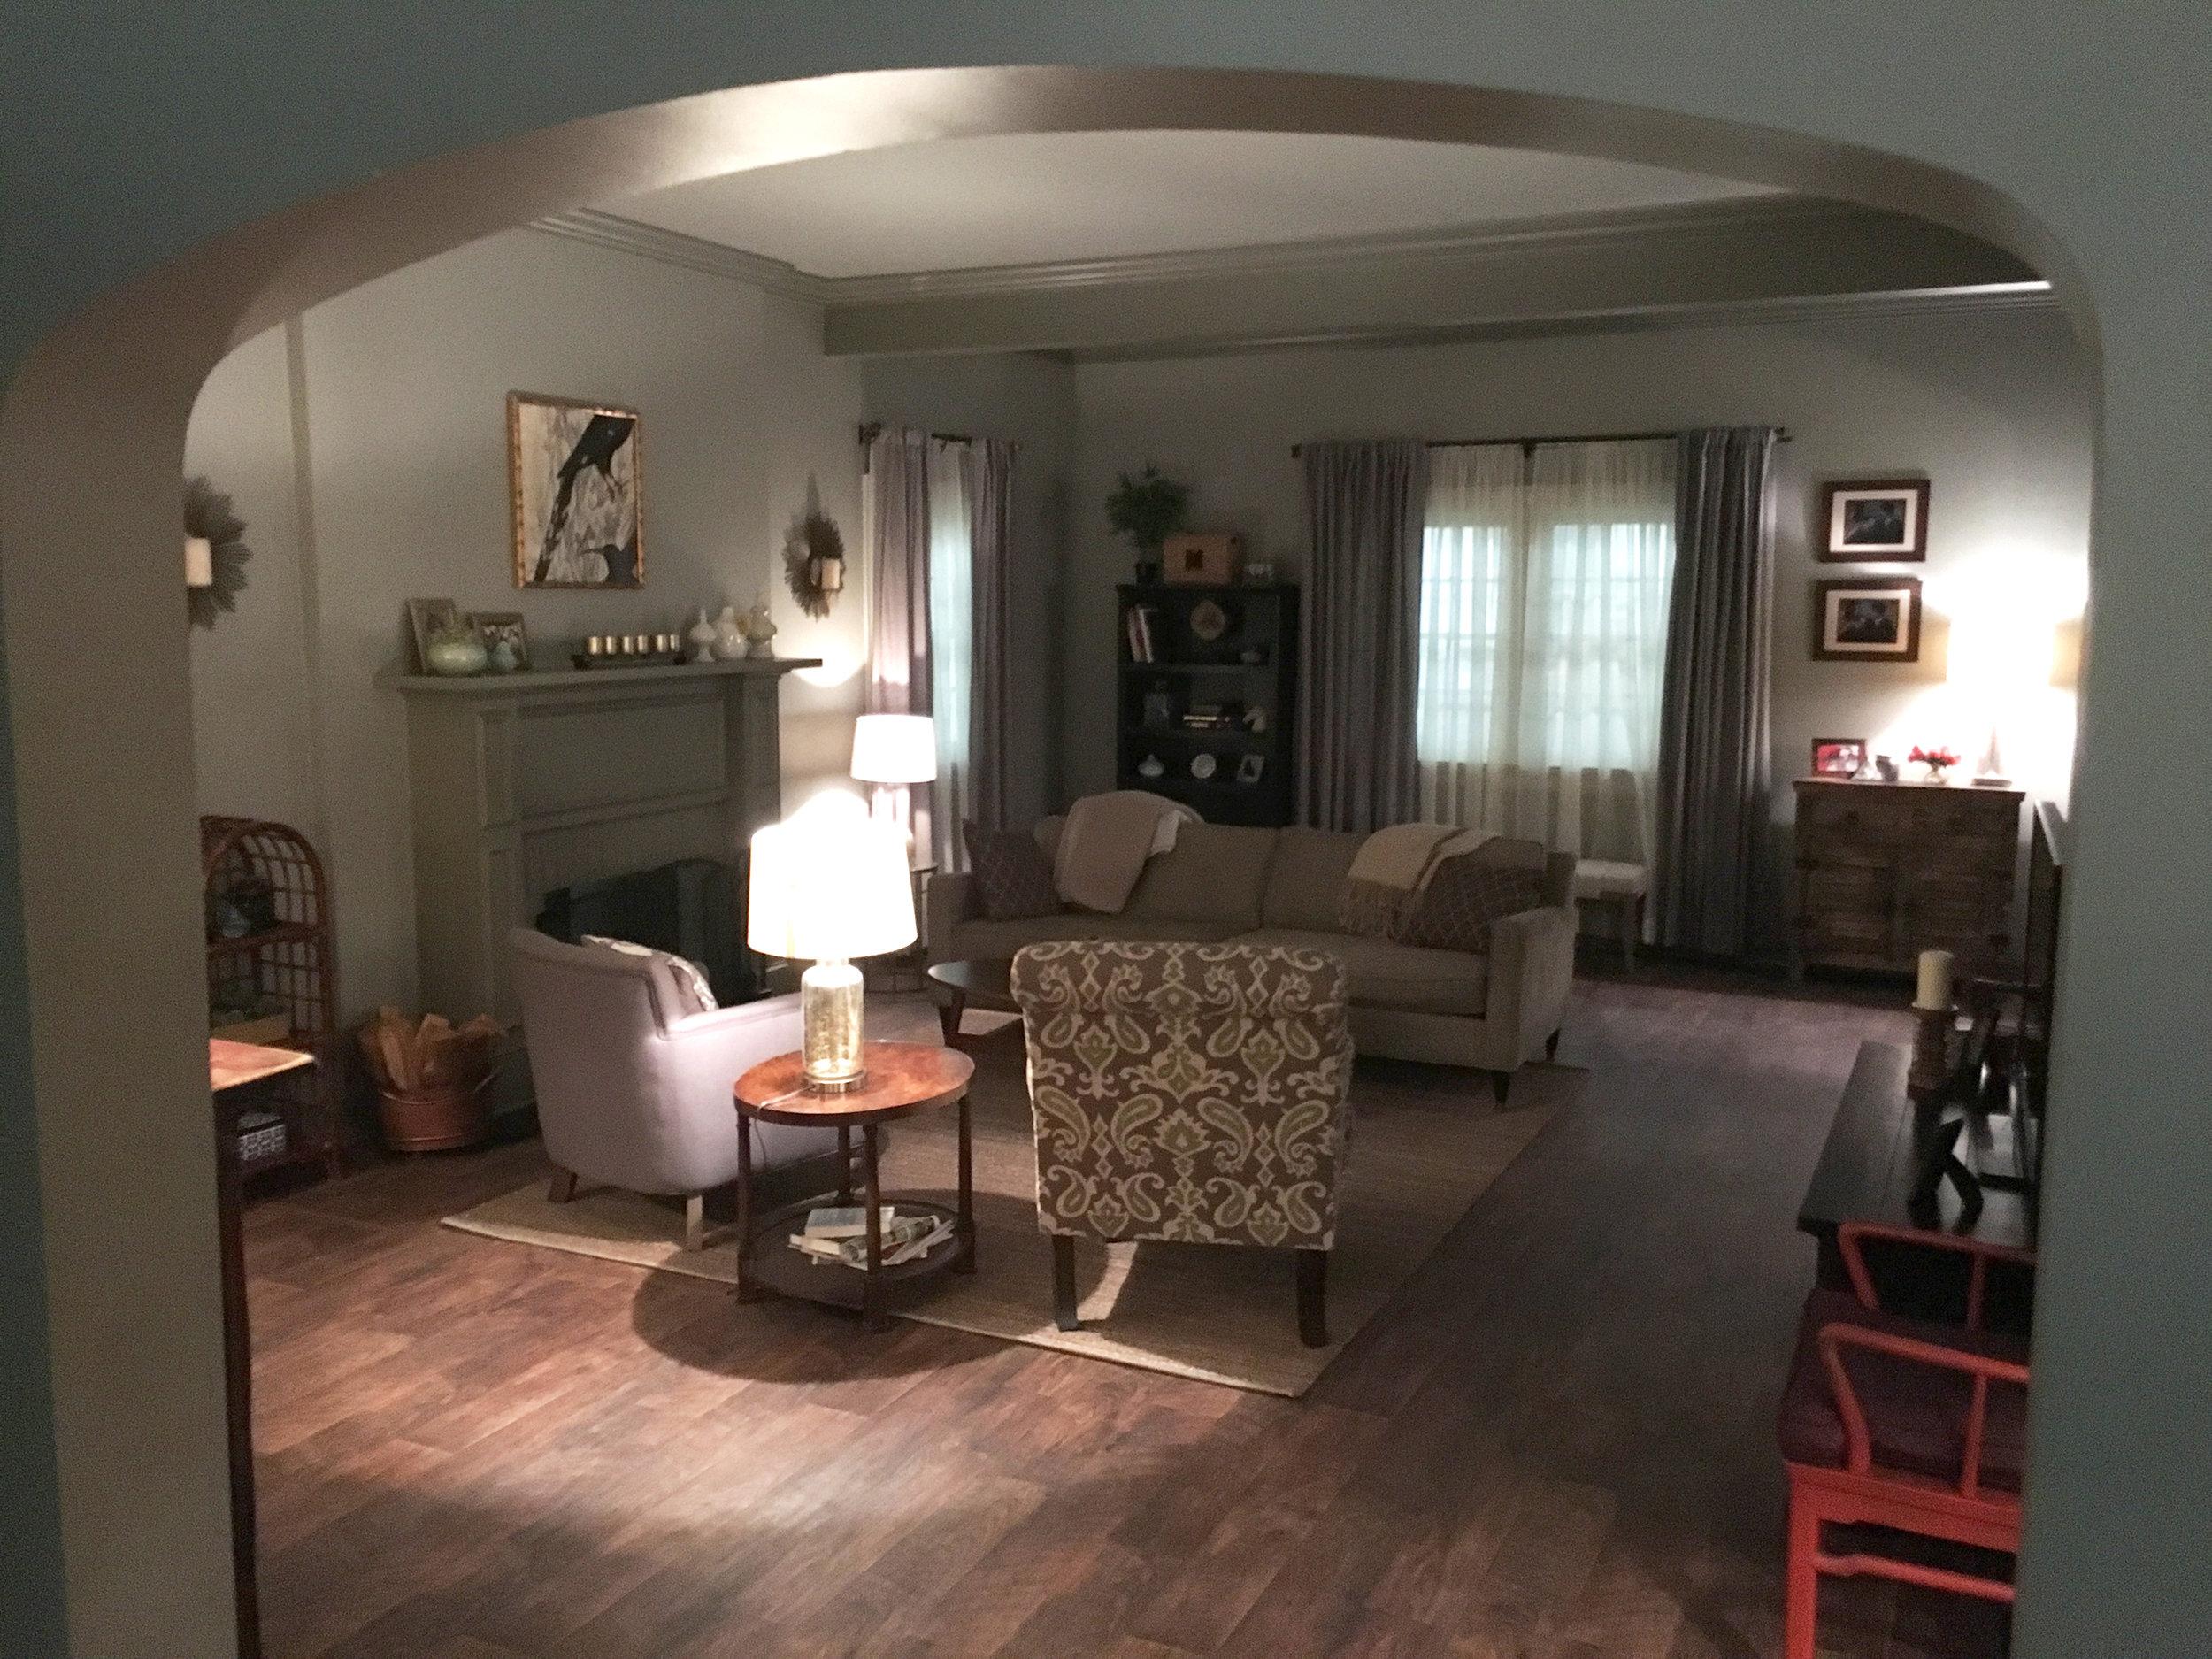 Capital Arts Set, Family Home